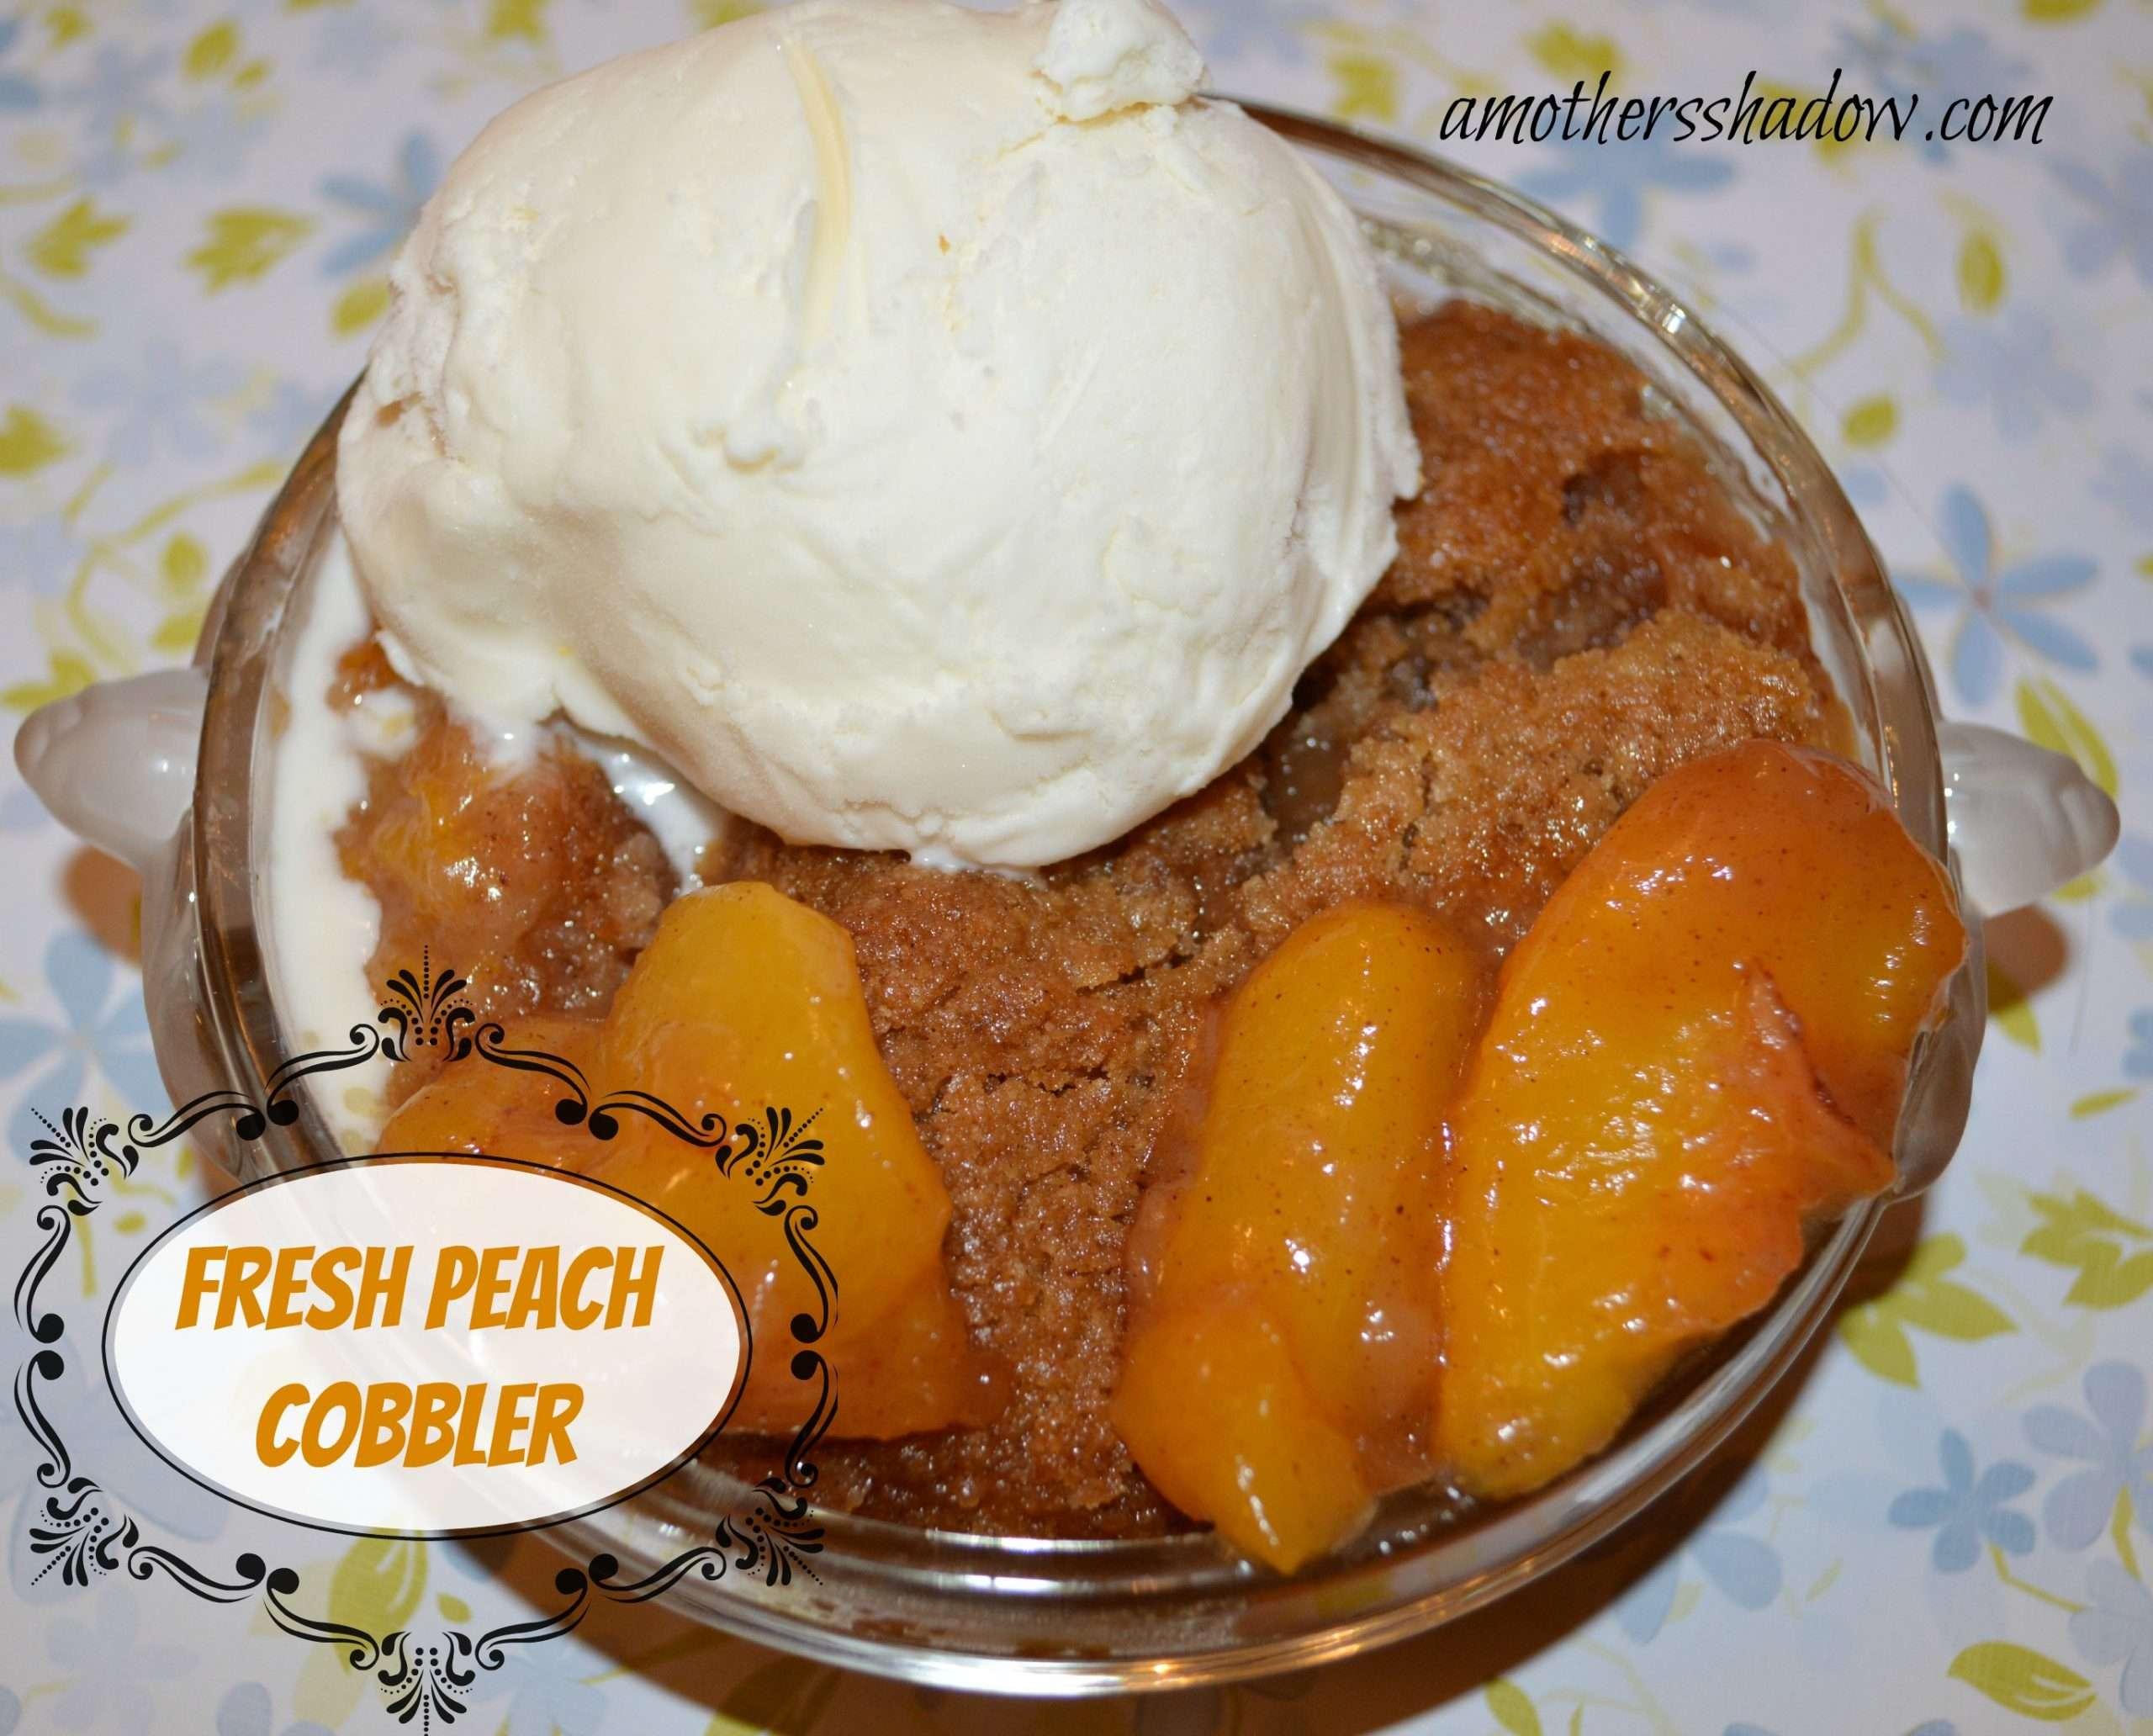 Old Fashioned Fresh Peach Cobbler